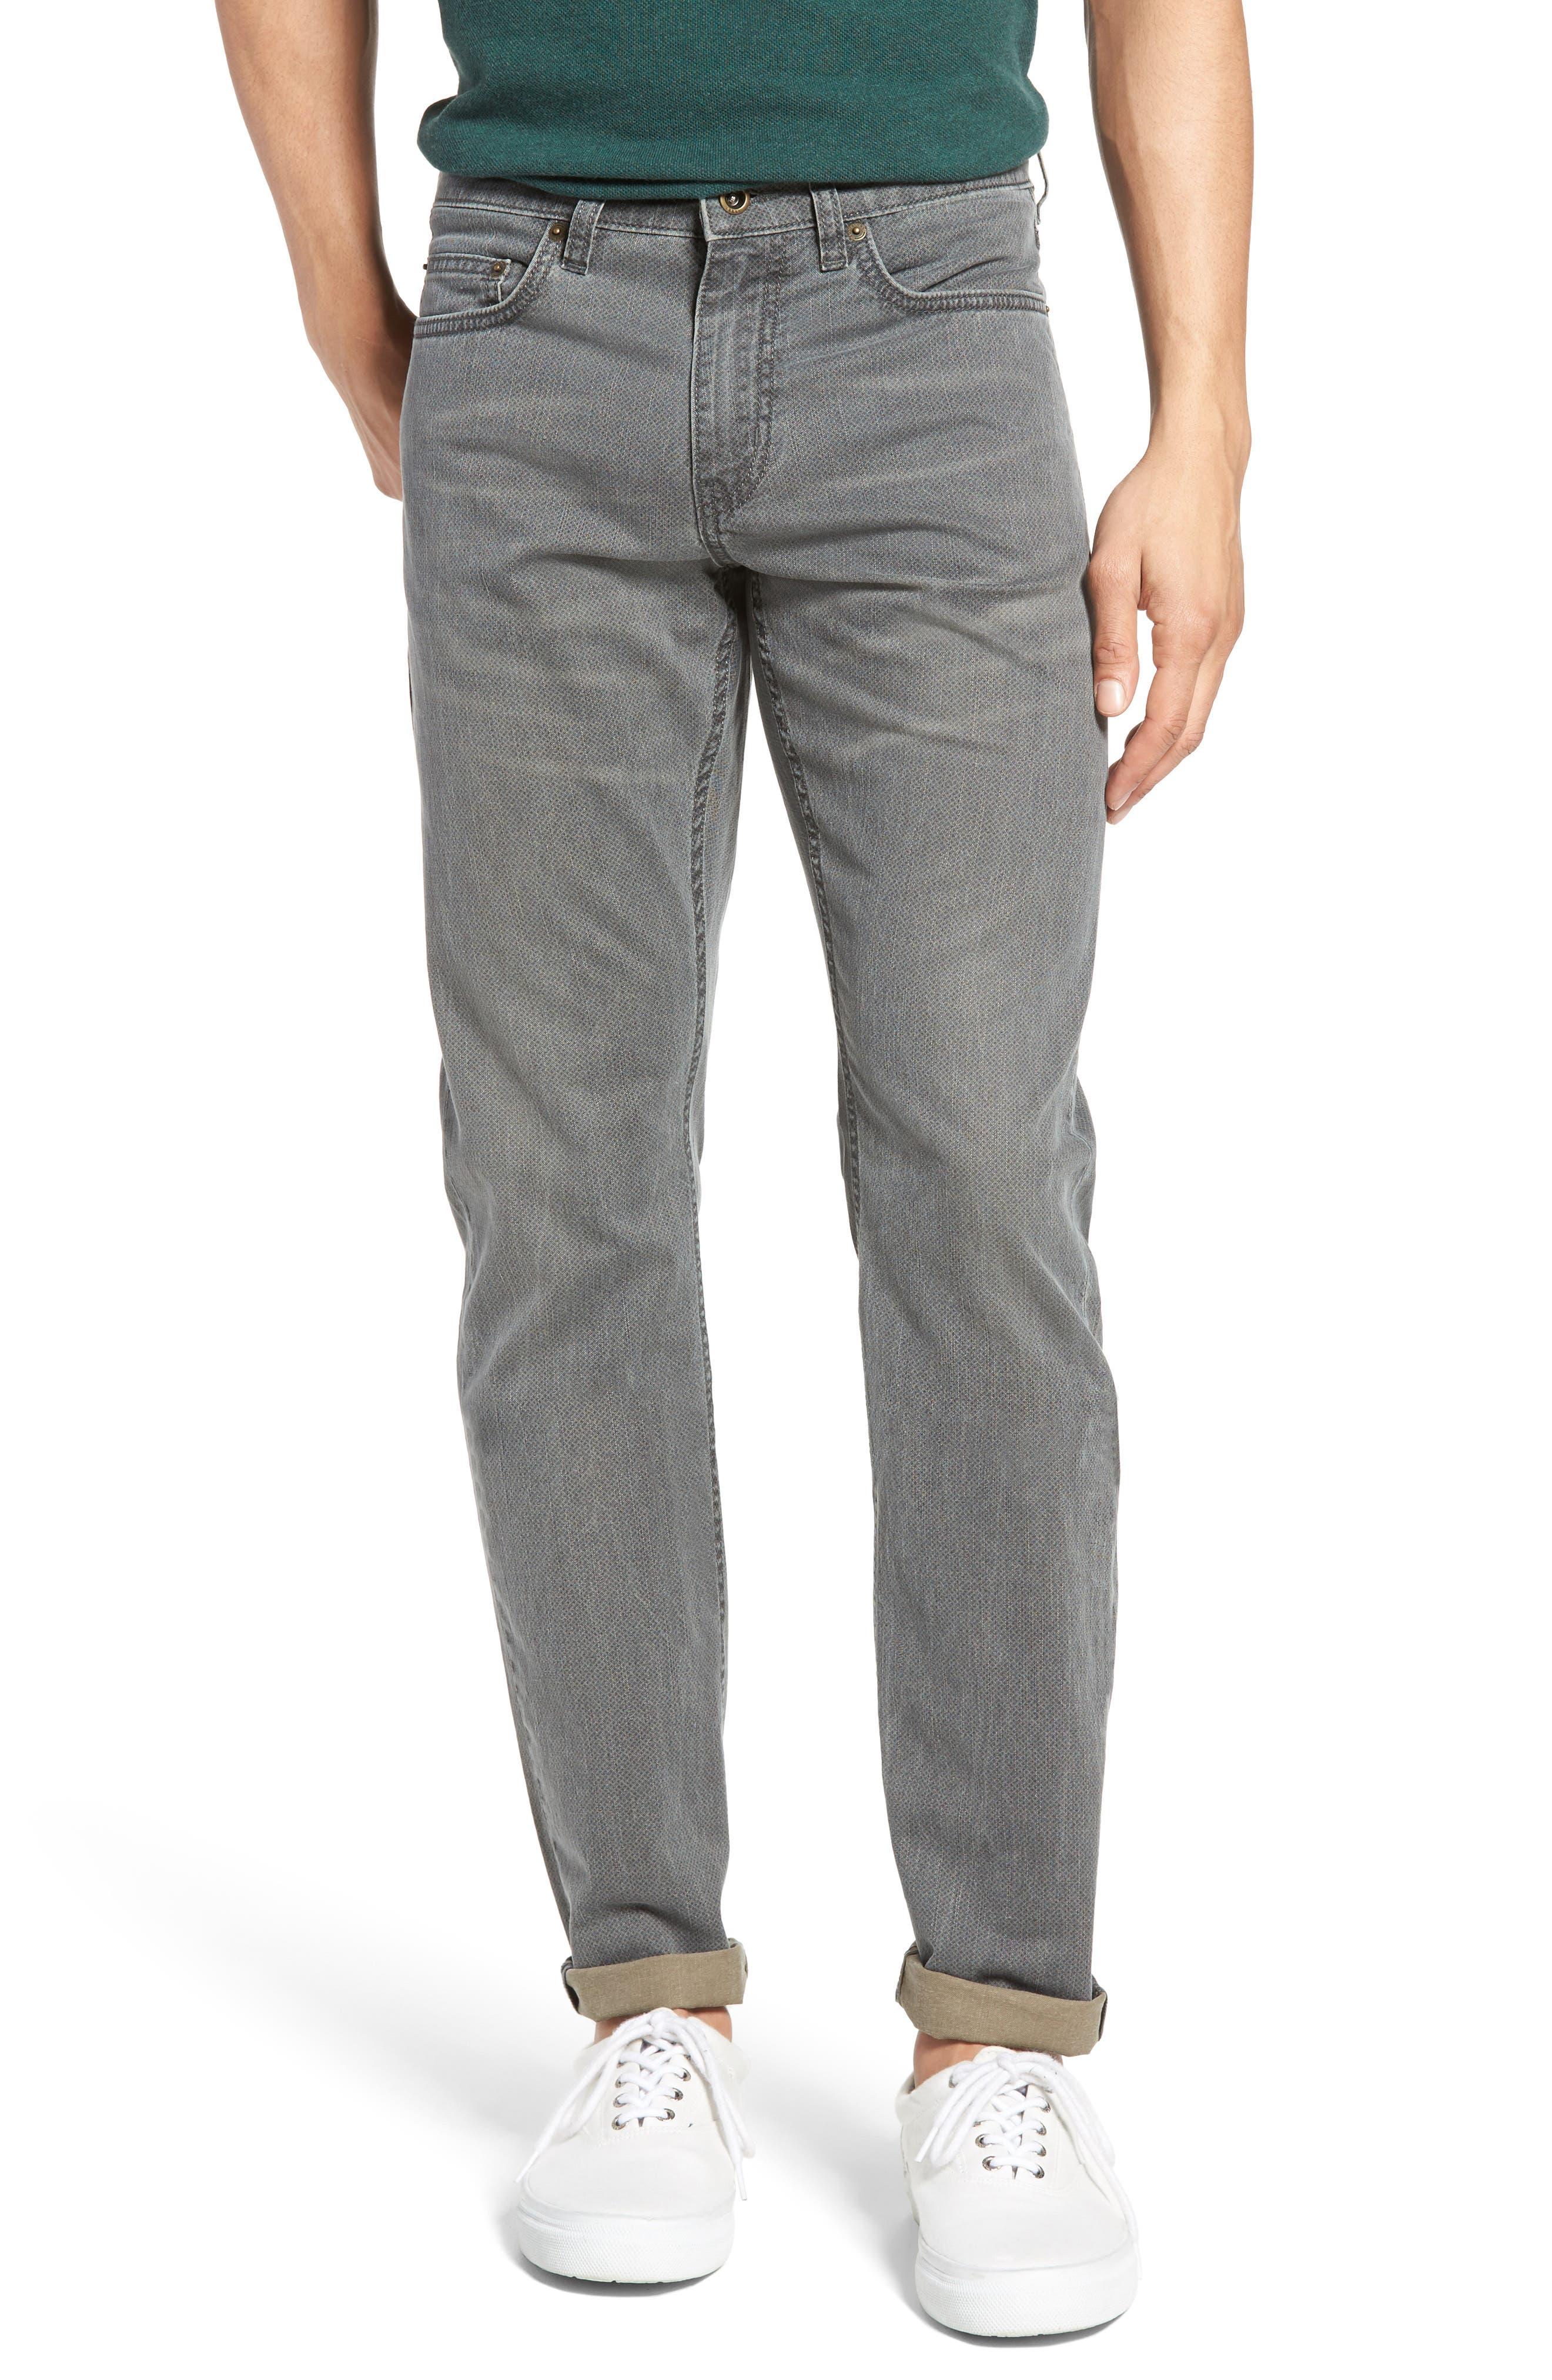 Rodd & Gunn Landsborough Straight Leg Jeans